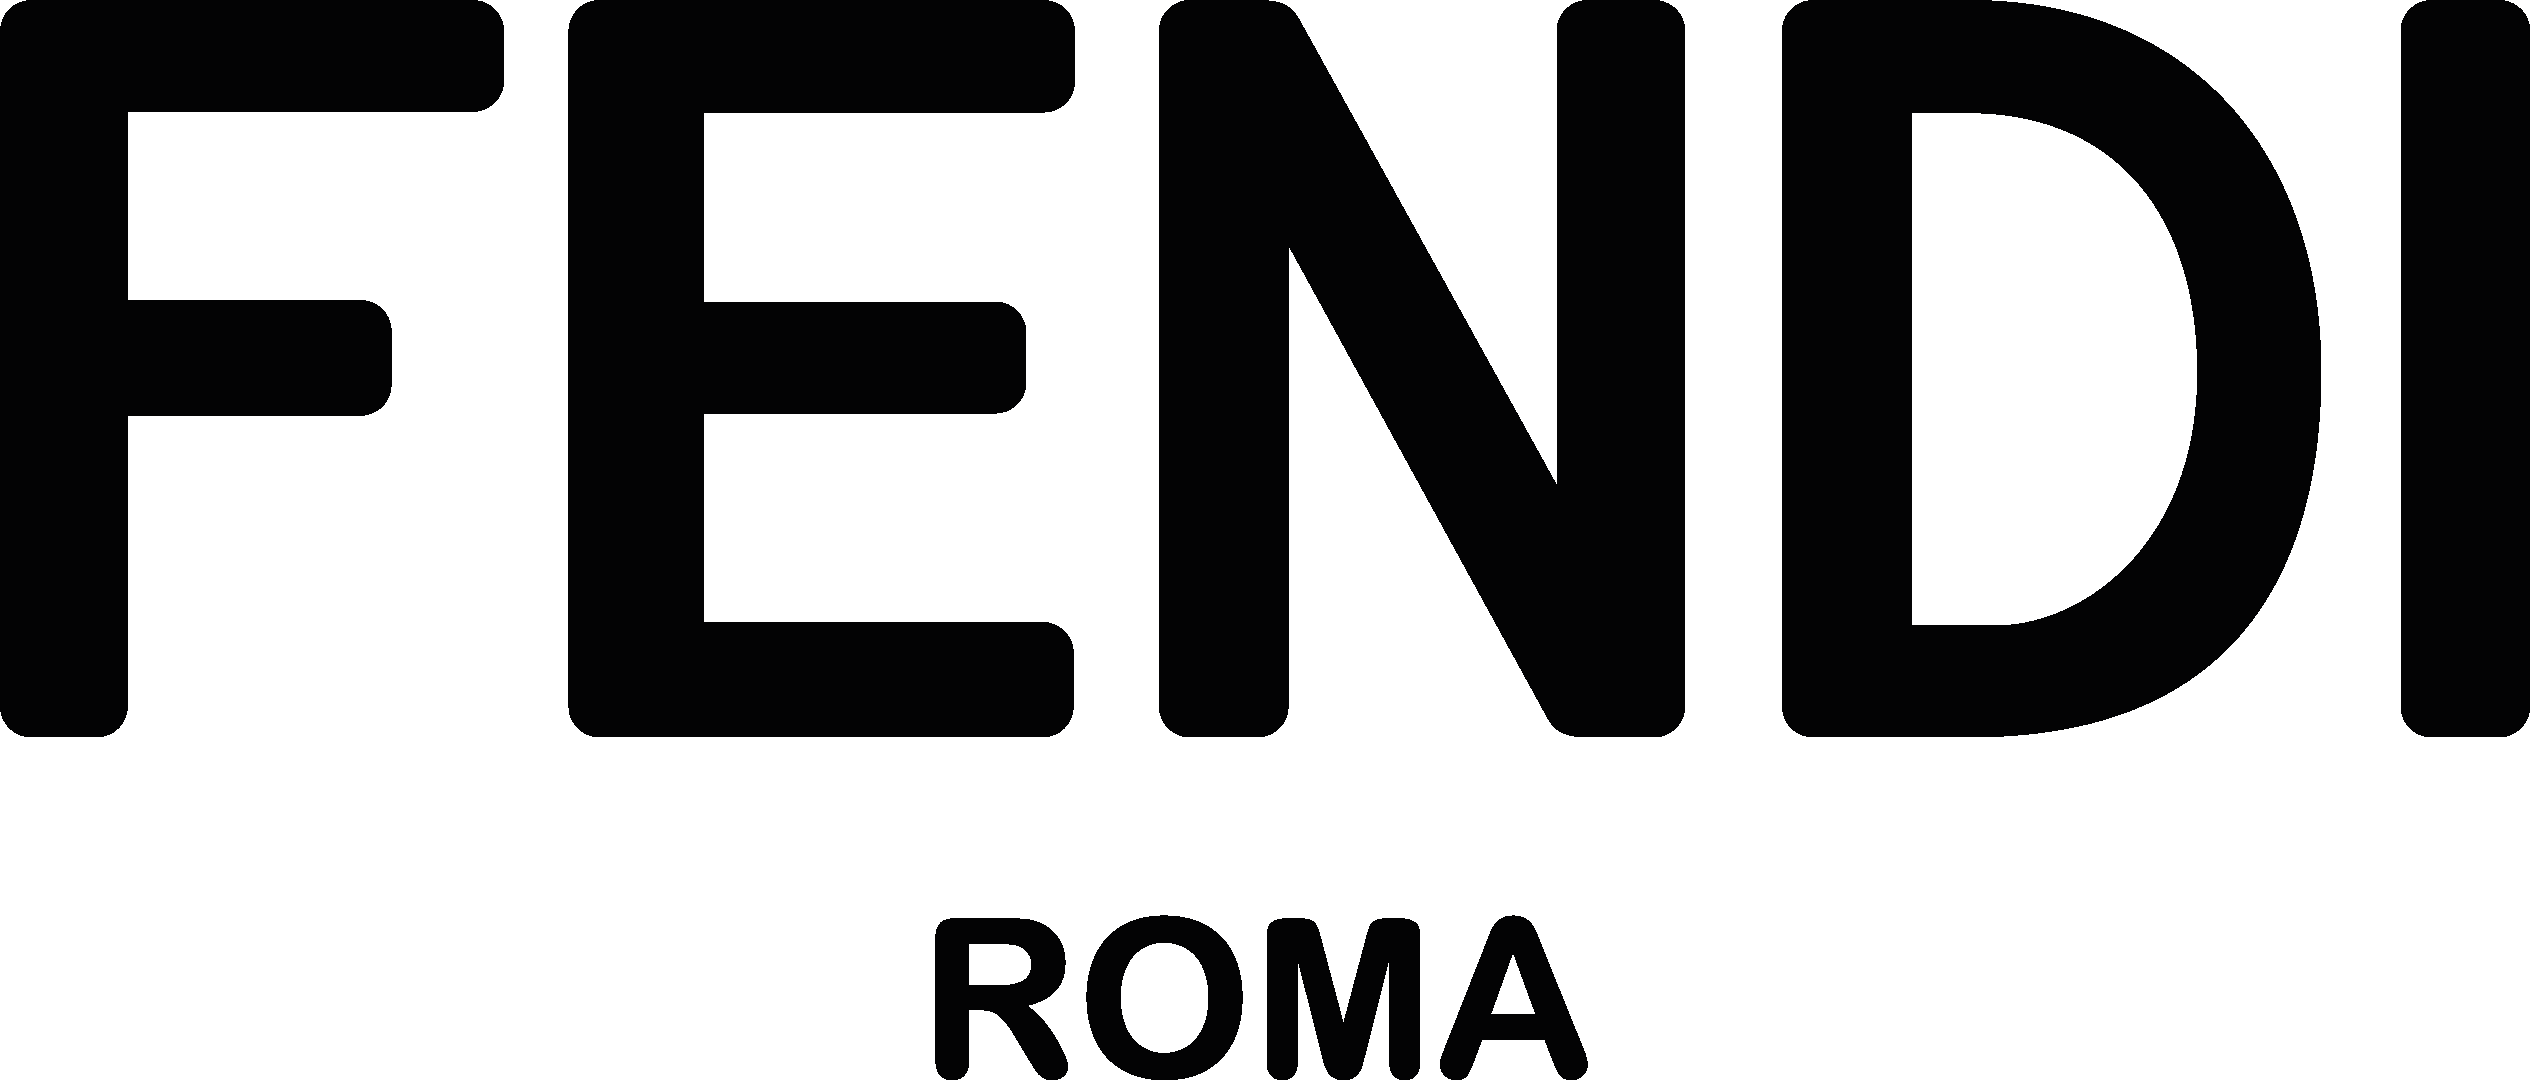 Fendi logo clipart banner library download Fendi Logo Vector Icon Template Clipart Free Download banner library download